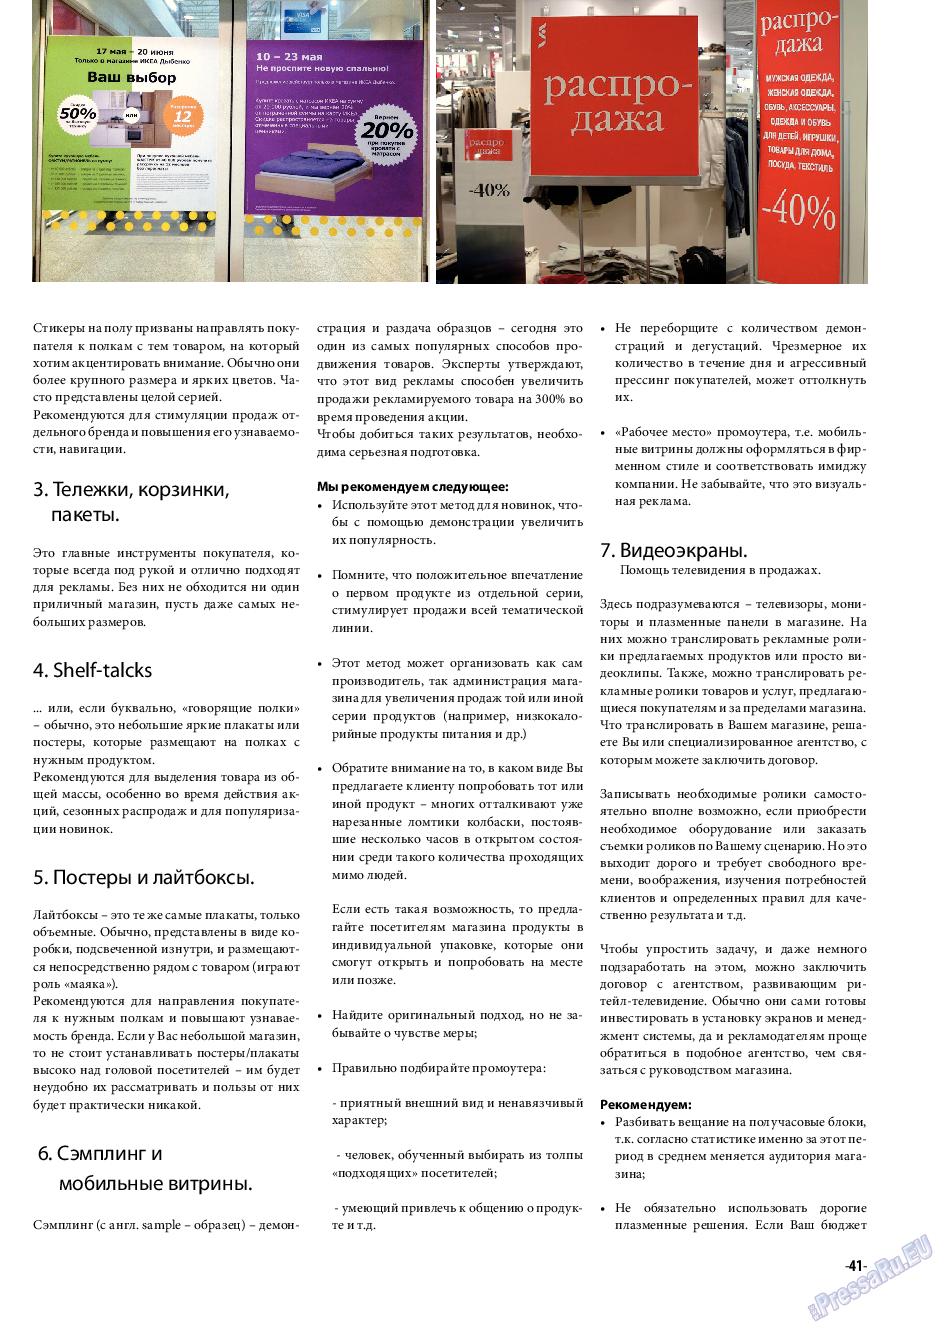 iDEAL (журнал). 2015 год, номер 12, стр. 41